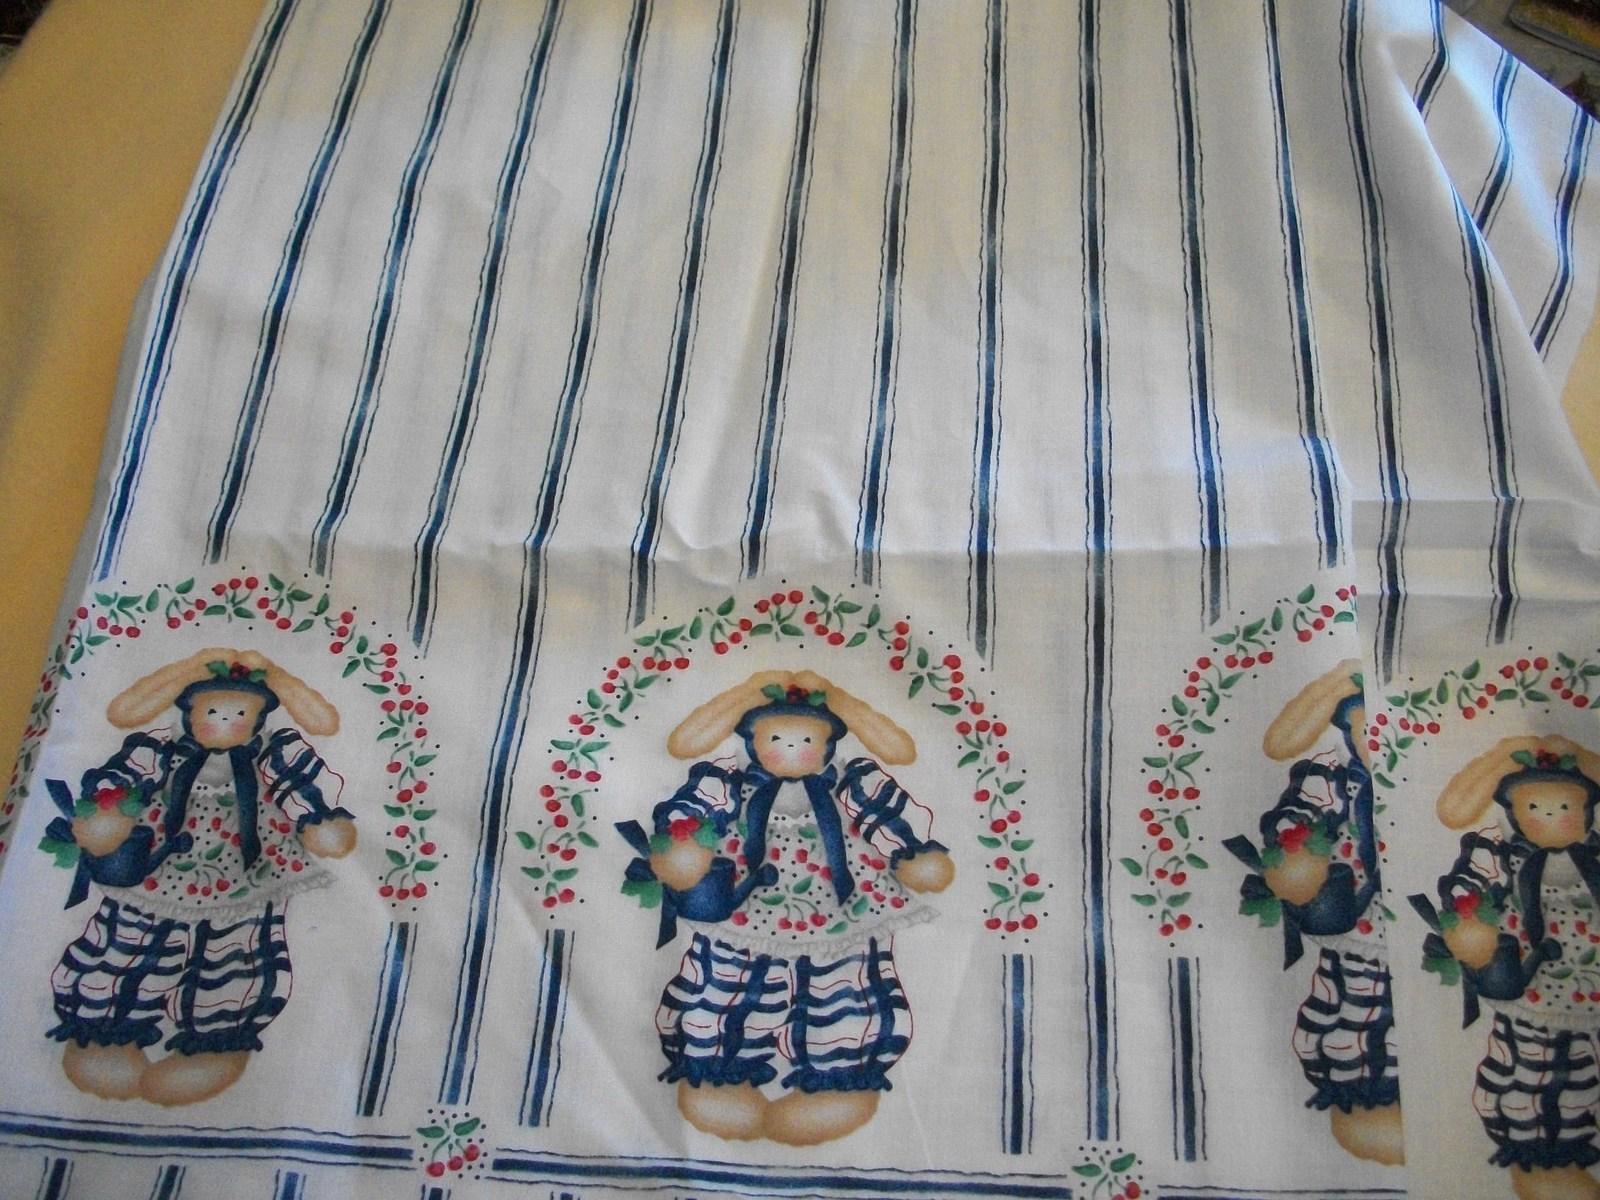 Elsie Bunny Border Print Fabric - $14.00